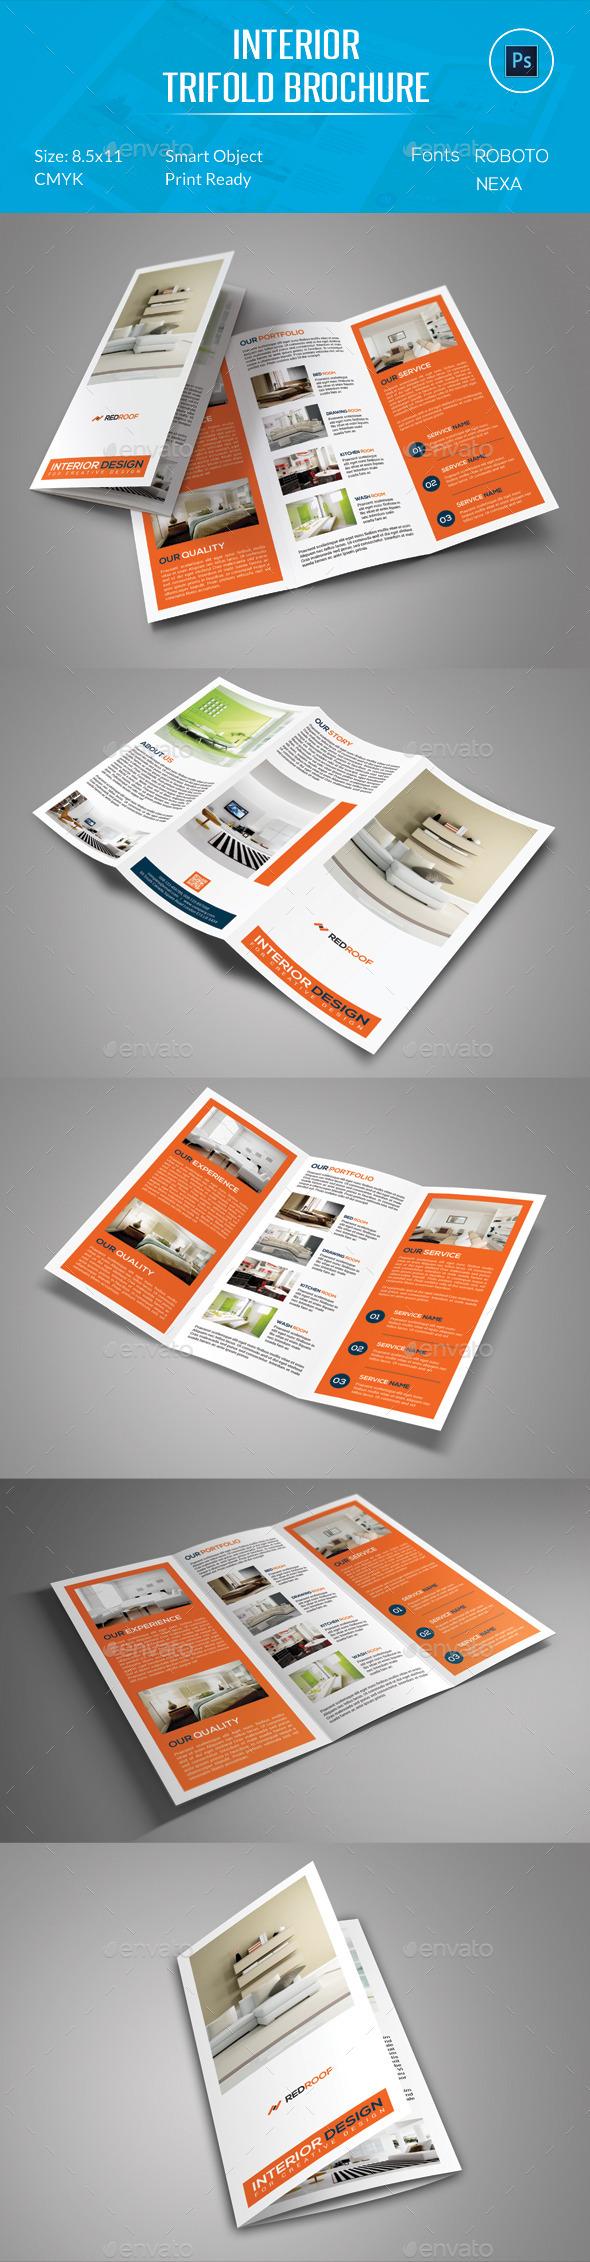 Interior Trifold Brochure - Corporate Brochures